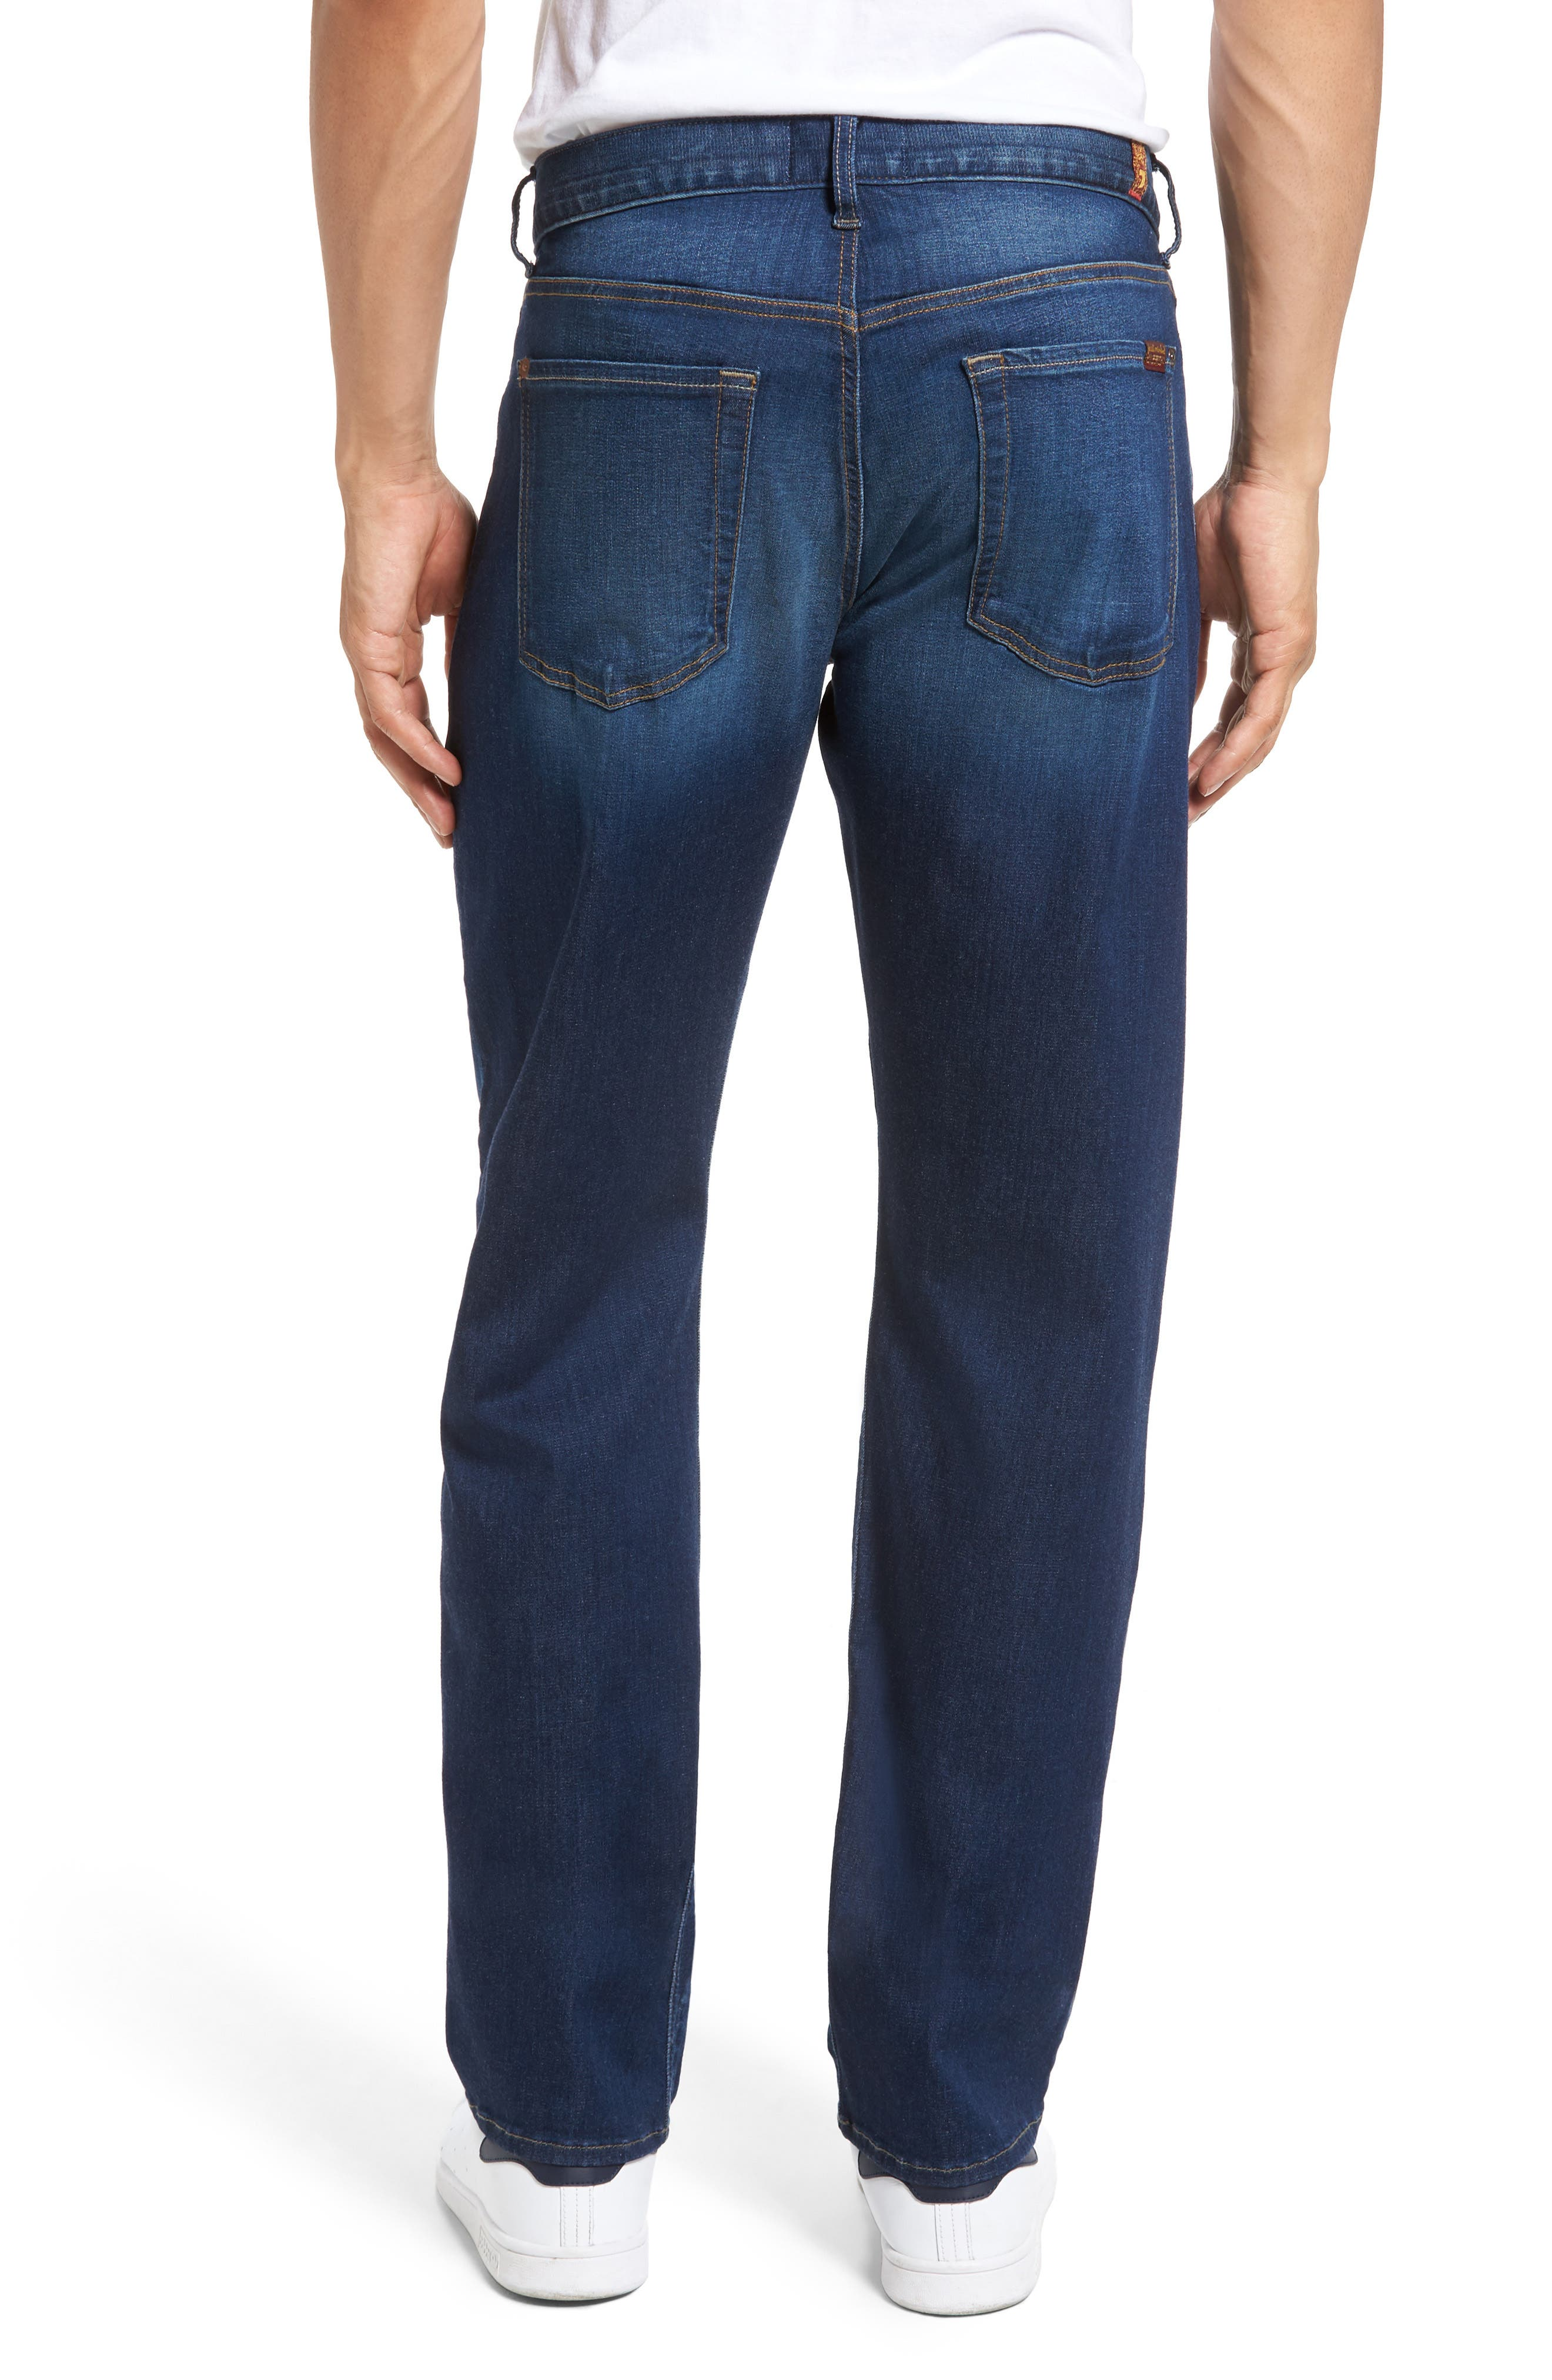 Slimmy Slim Fit Jeans,                             Alternate thumbnail 2, color,                             406